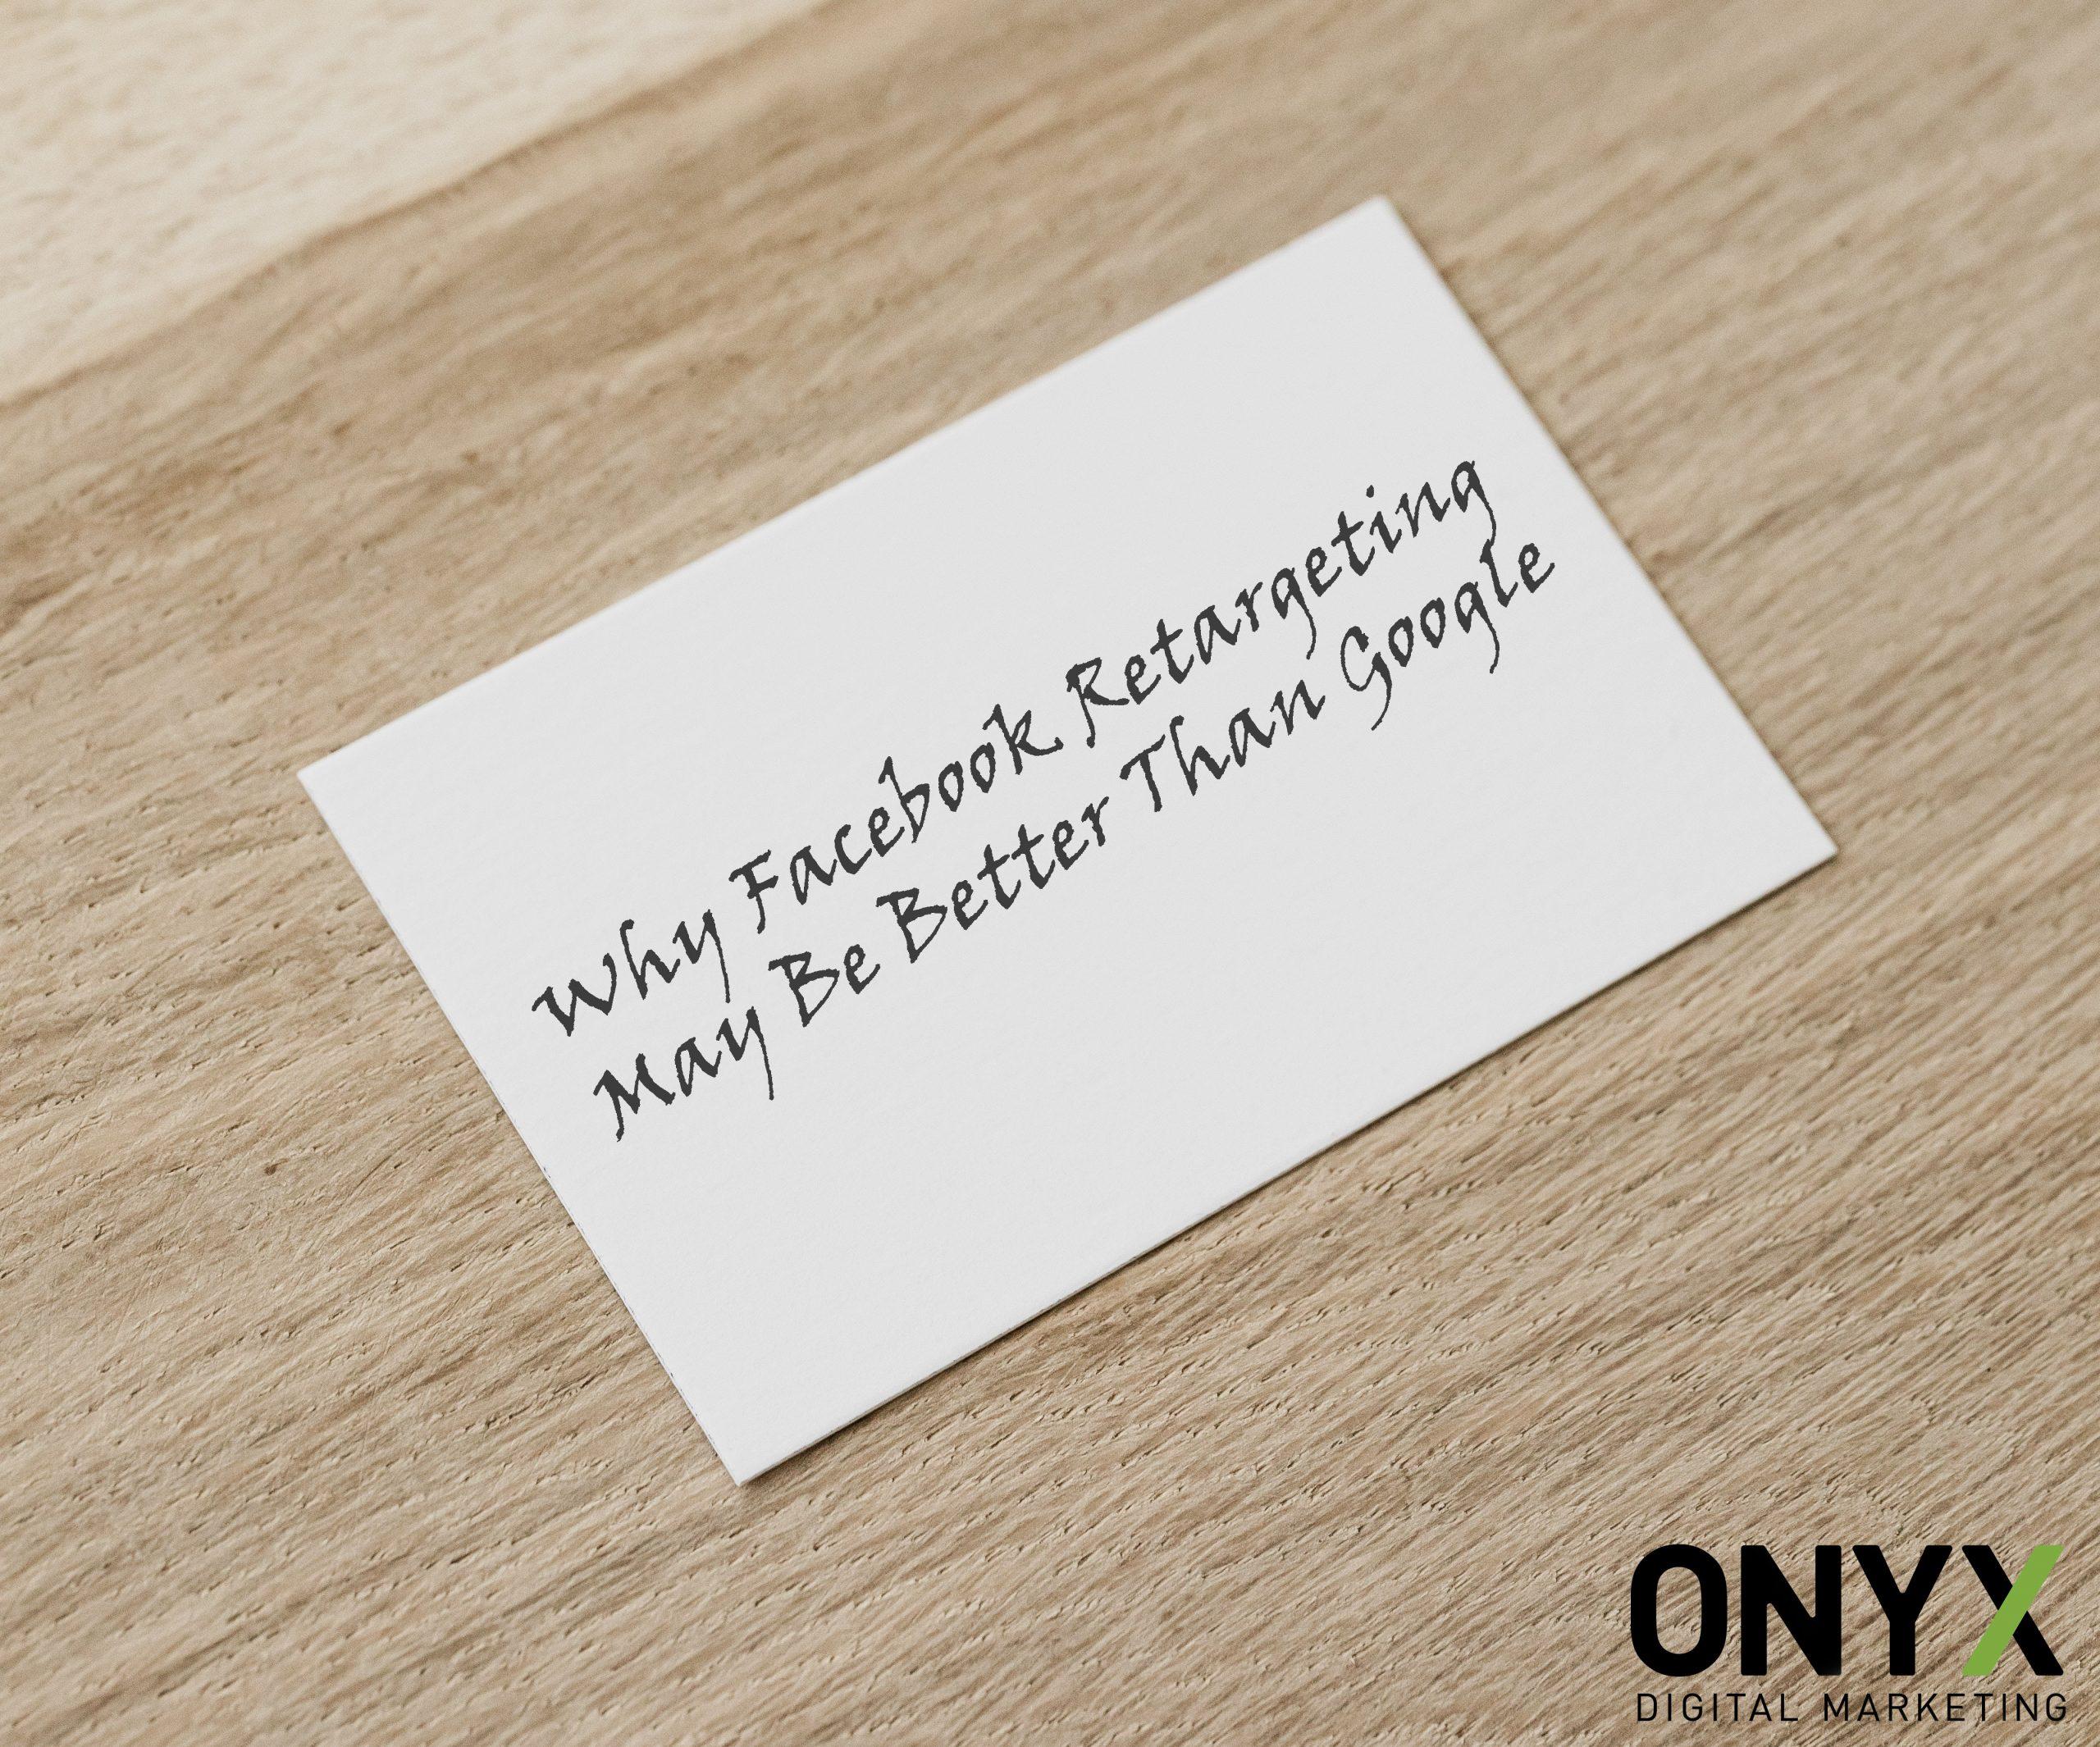 Why Facebook Retargeting May Be Better Than Google Onyx Digital Marketing